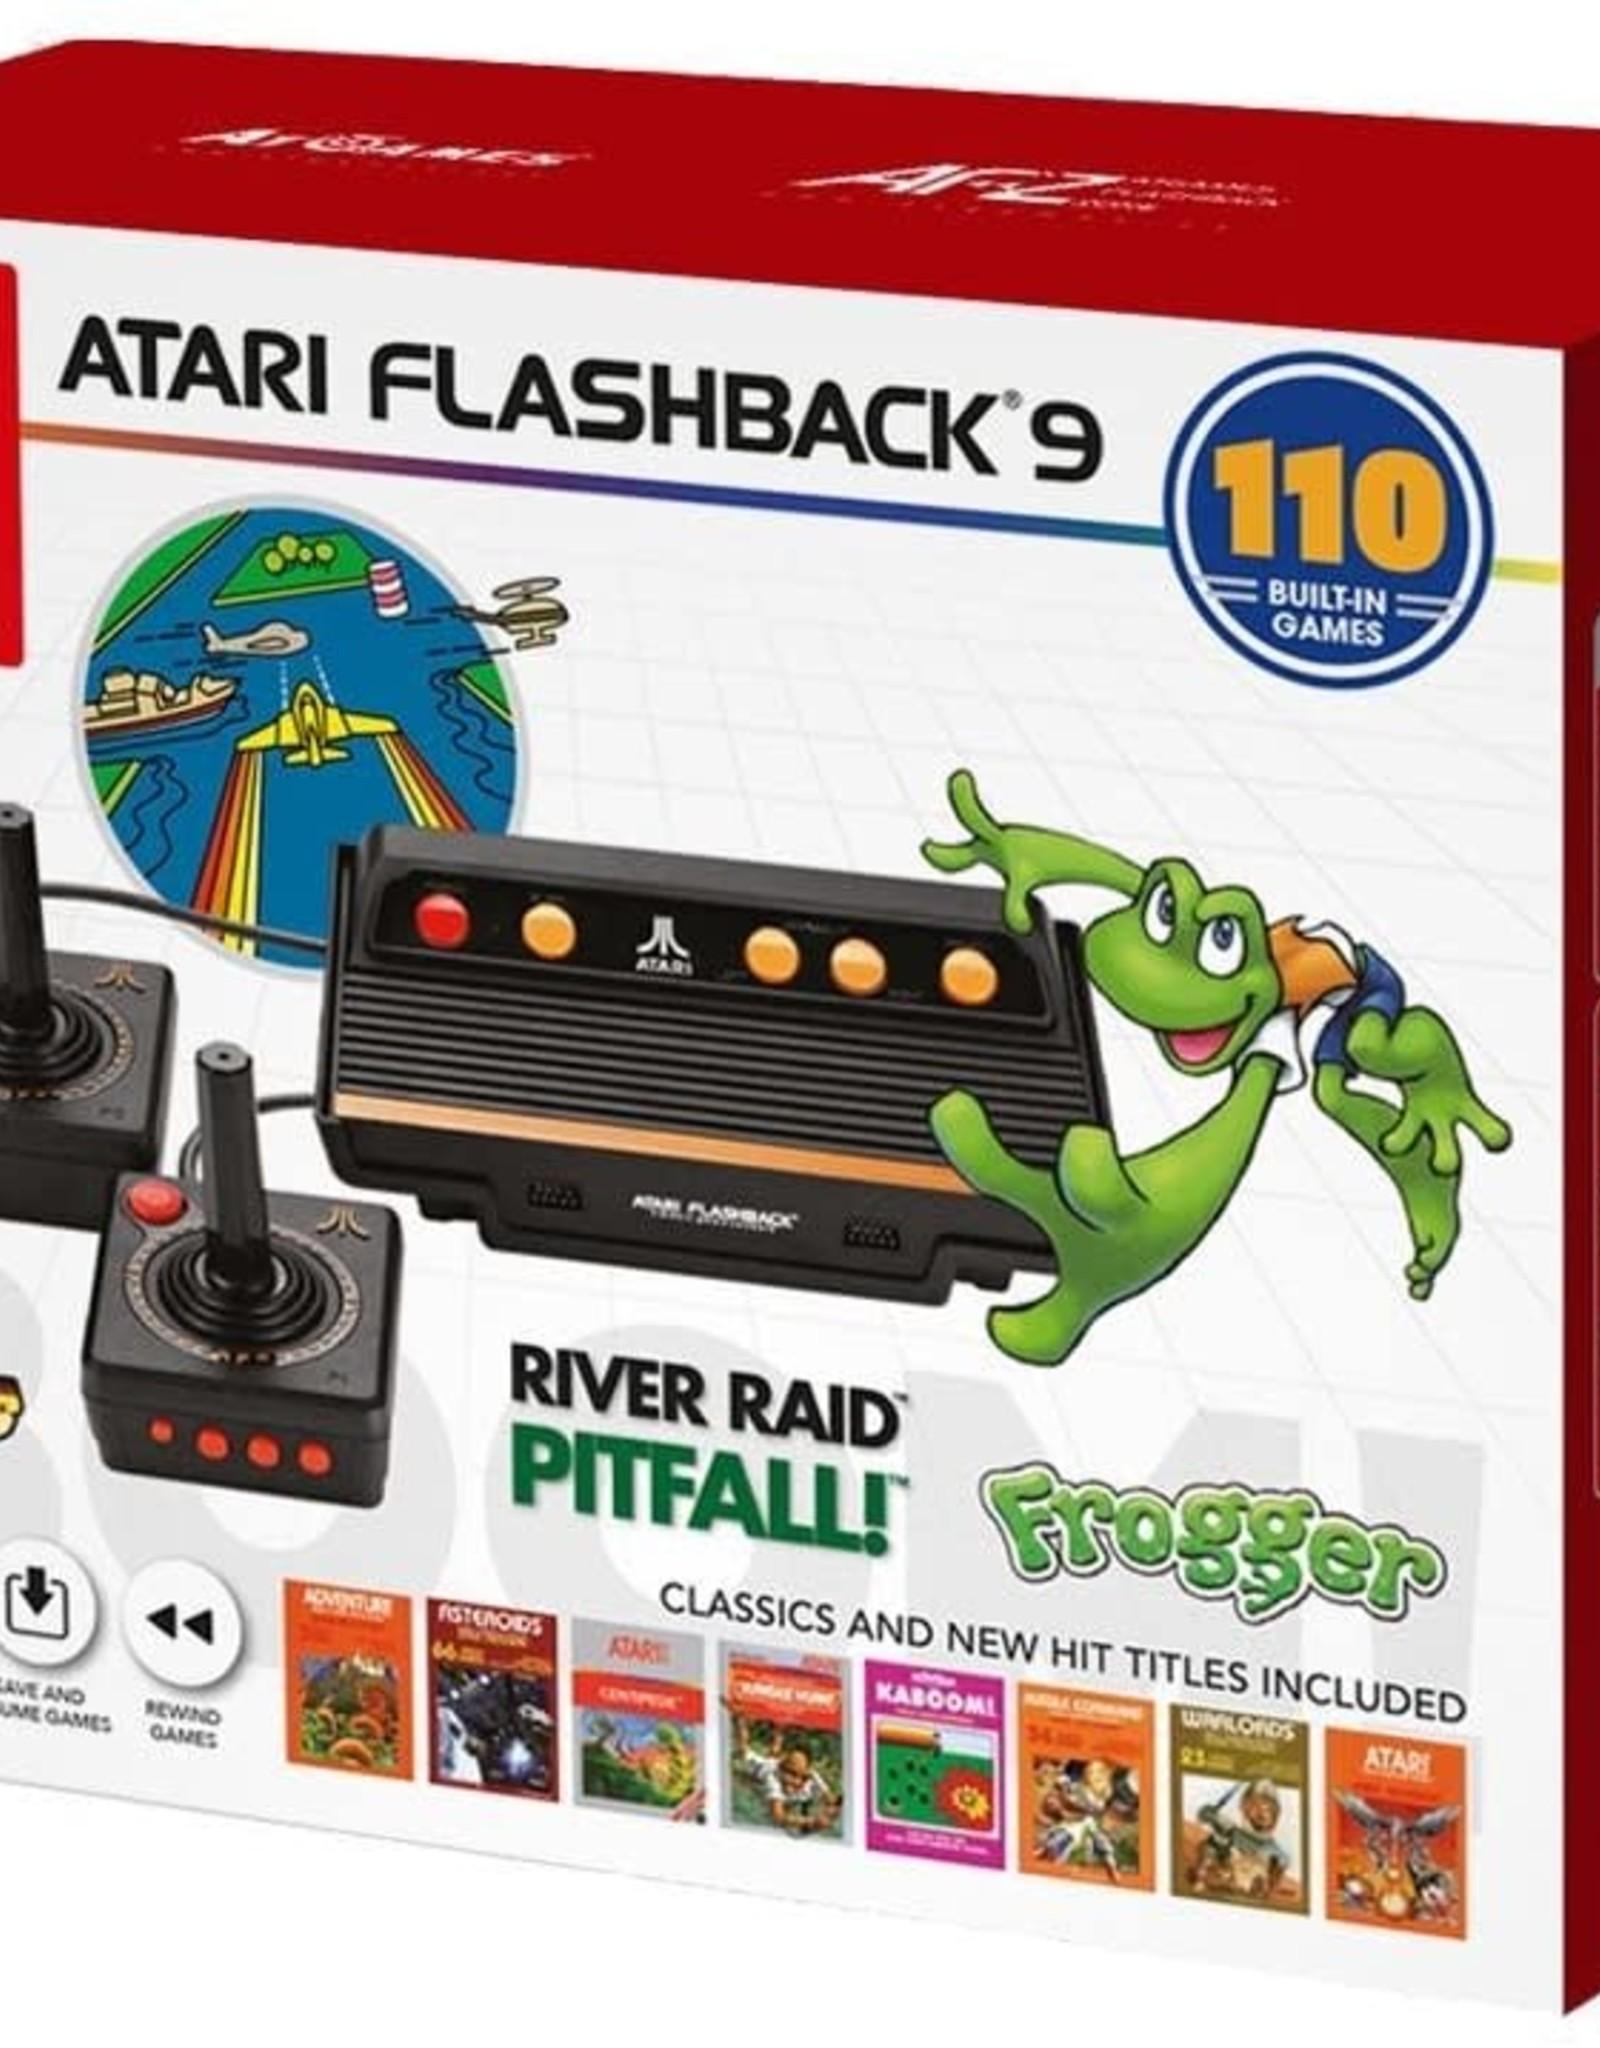 Atari 2600 Atari Flashback 9 (USED)